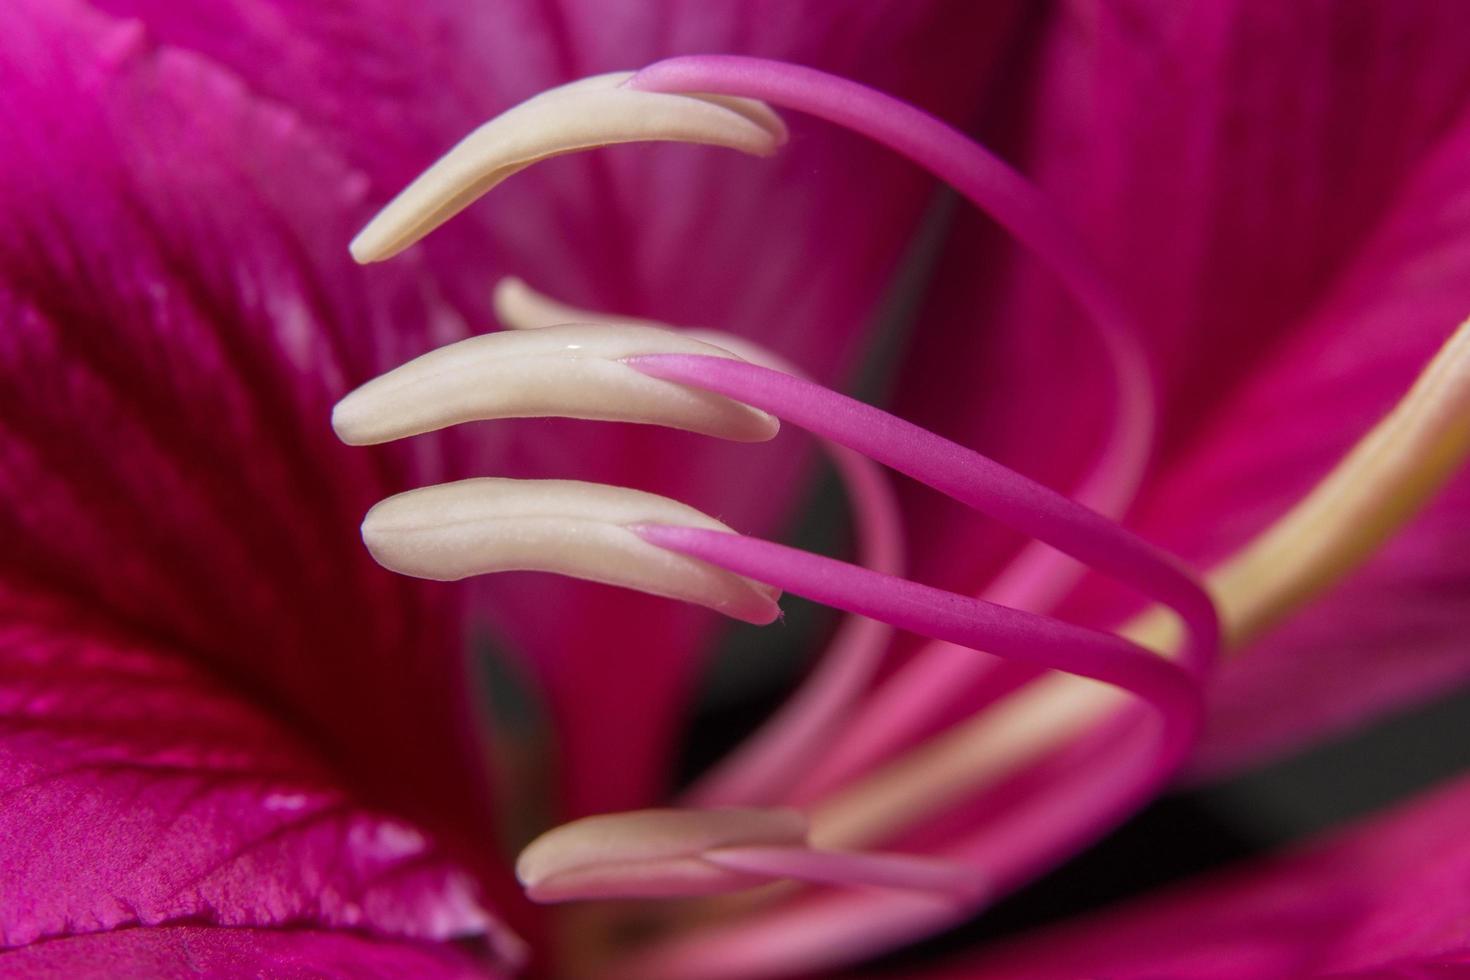 Pink pollen close-up photo